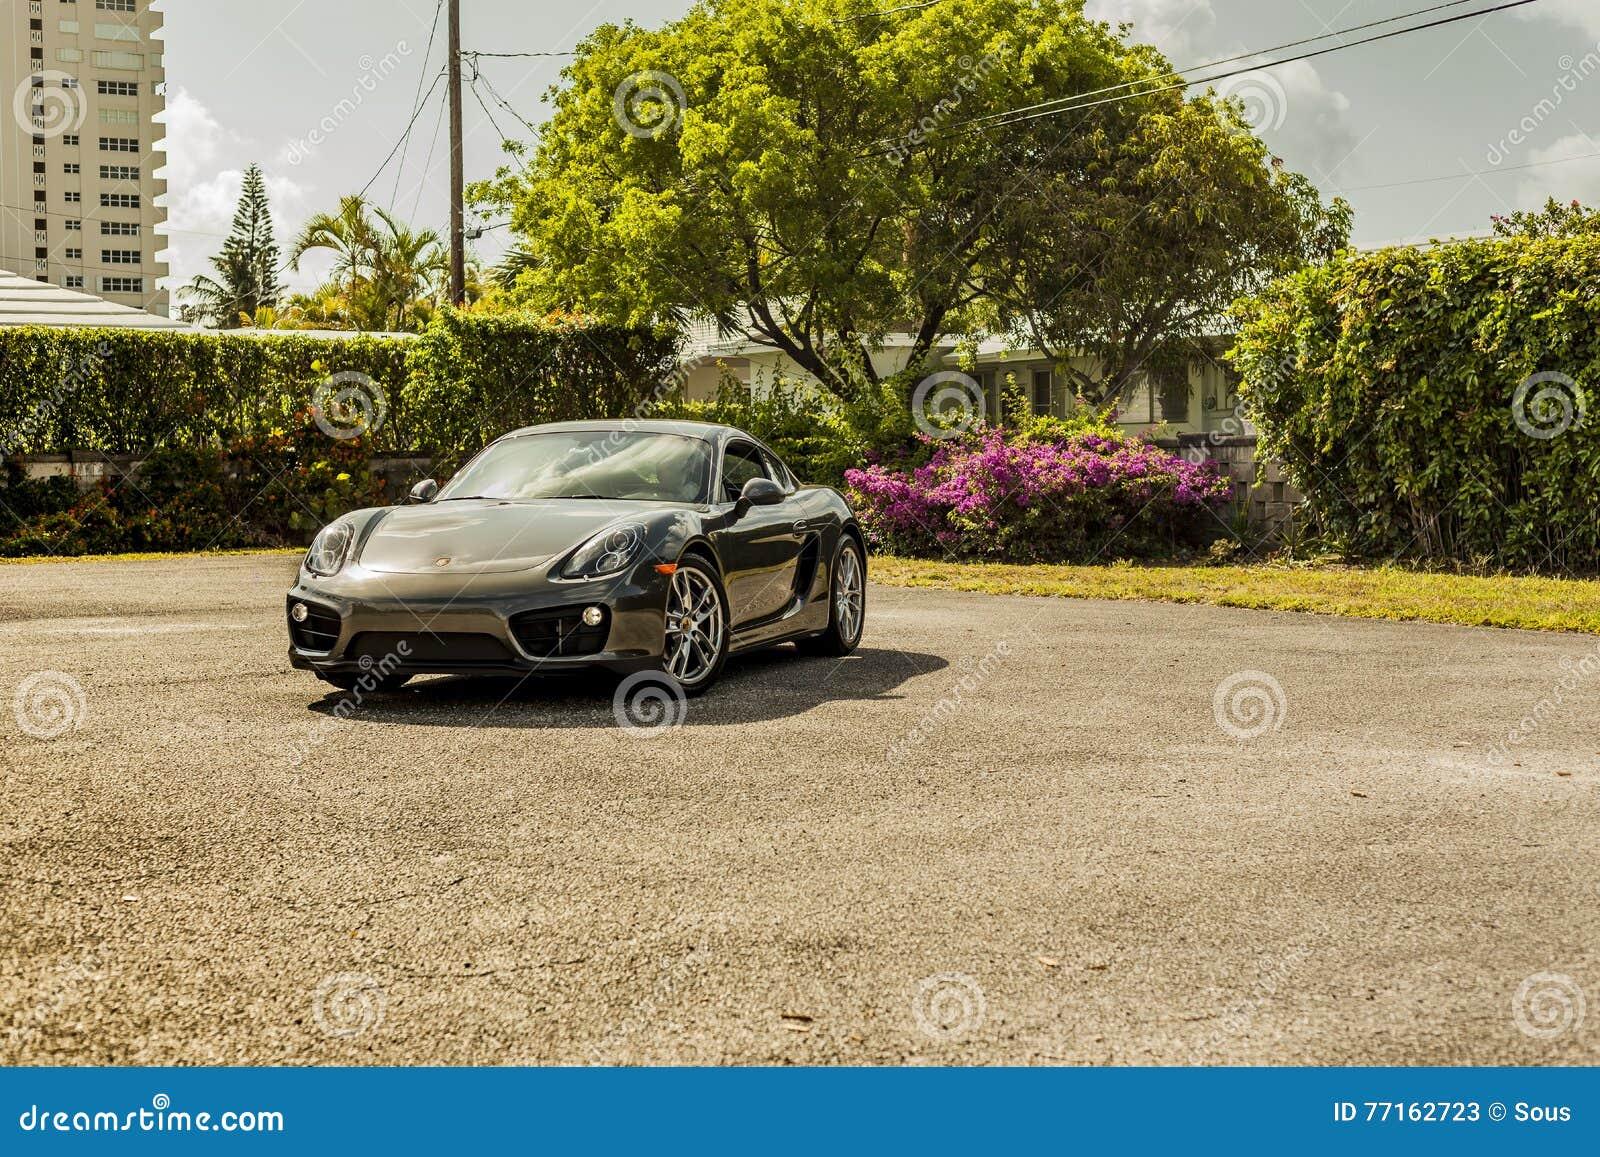 Grande possibilité éloignée Porsche Cayman Scène urbaine